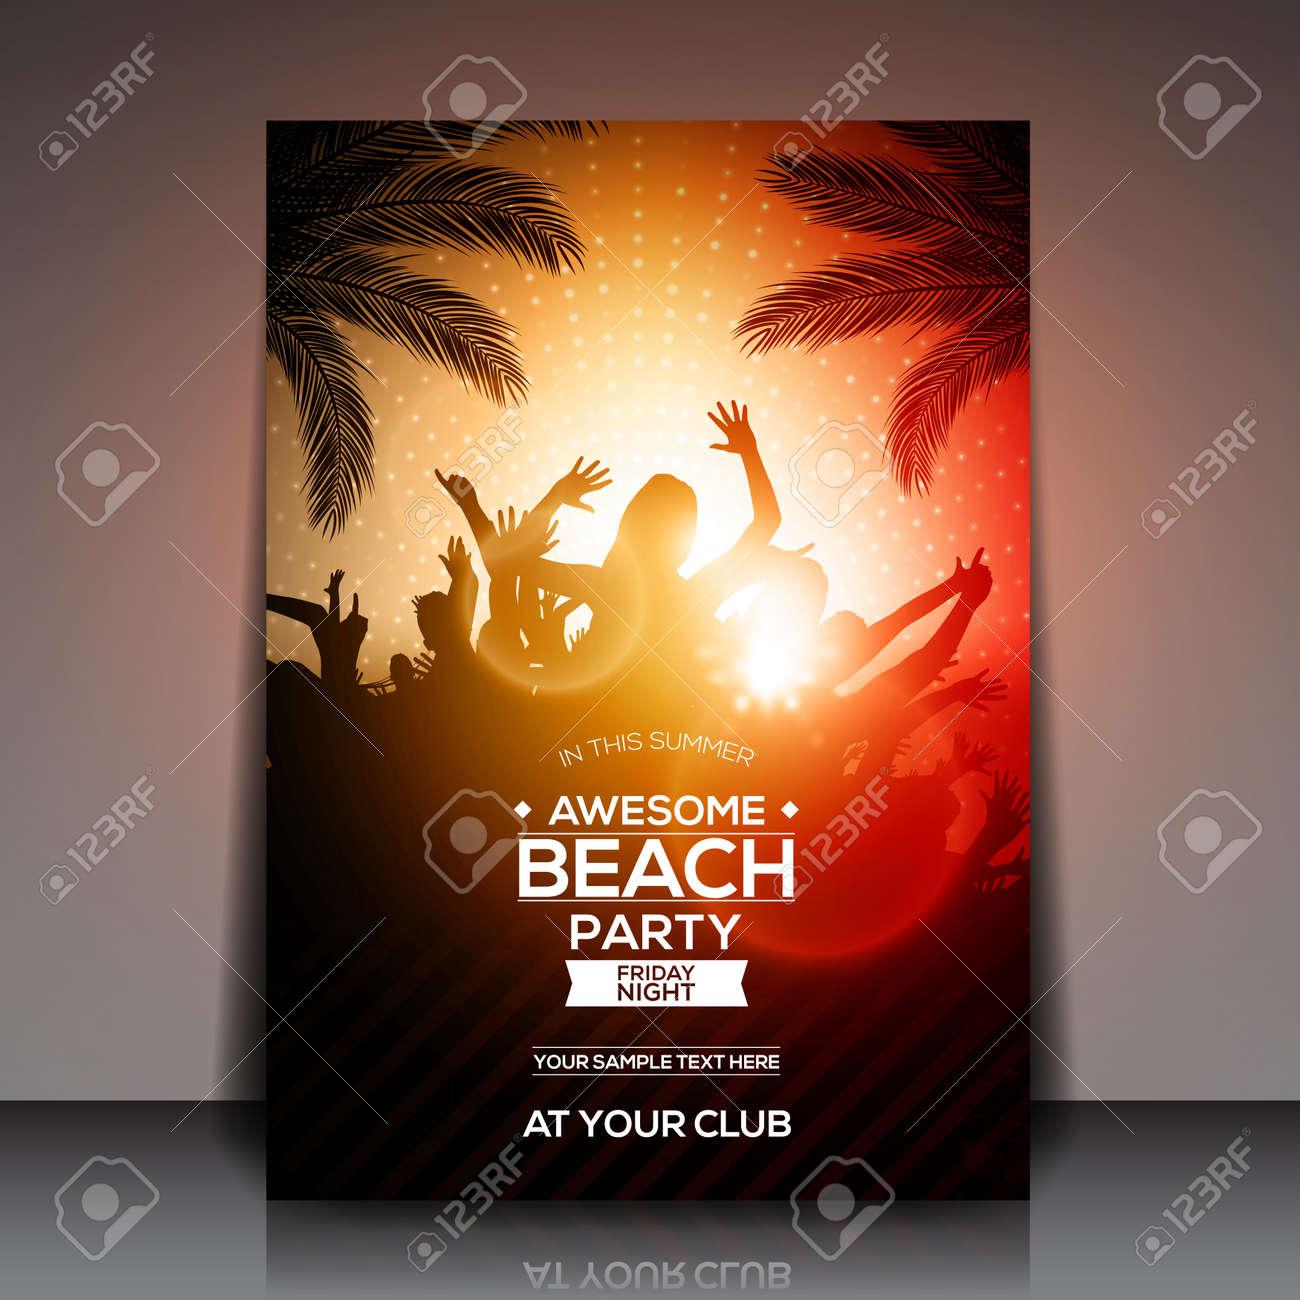 Orange Summer Beach Party Flyer Template - Vector Design Royalty ...